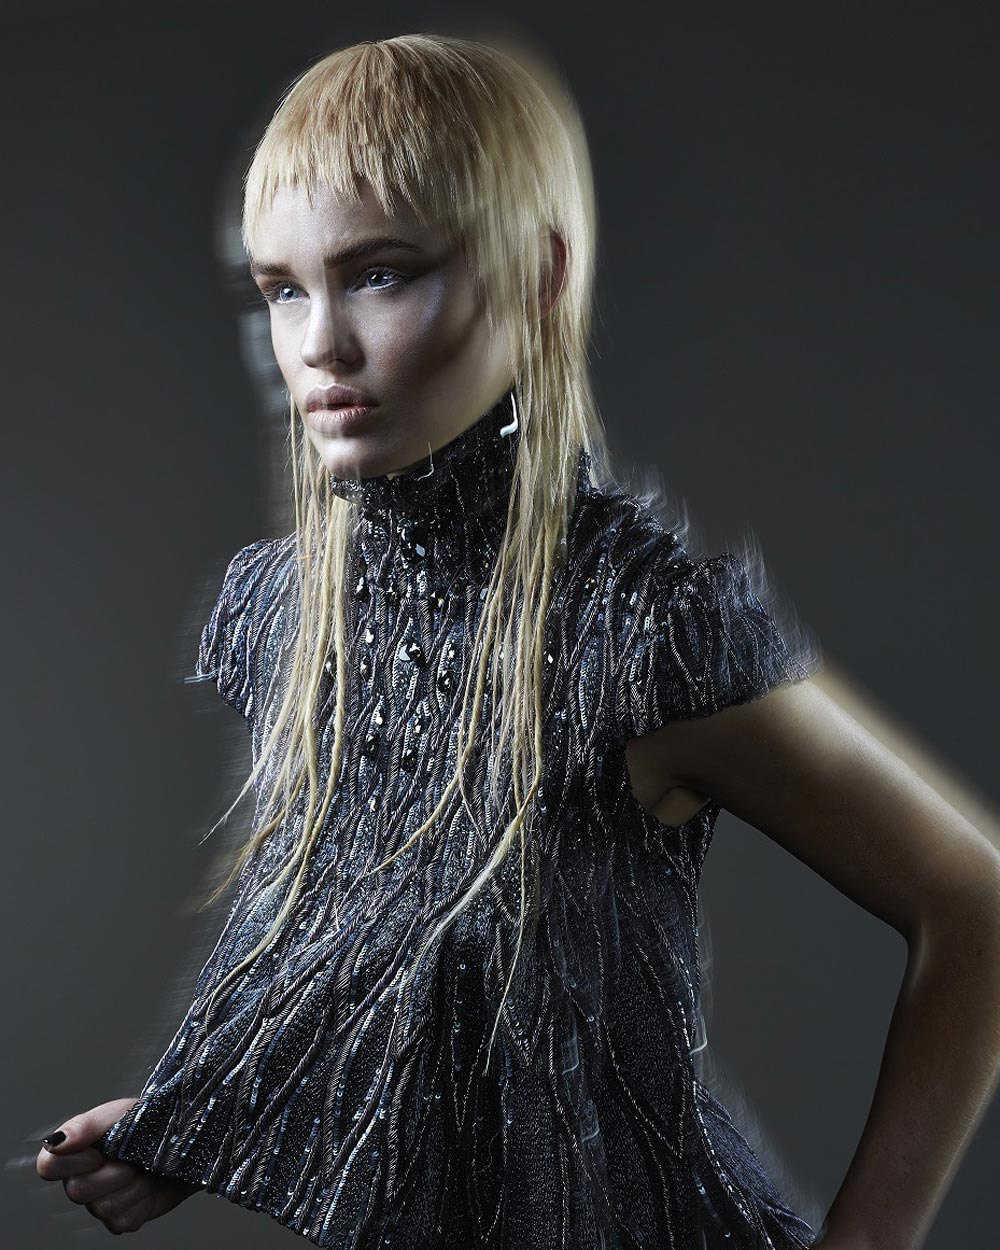 Střihy pro dlouhé vlasy 2016 – é SALON, kolekce Fluidity (vlasy: Emiliano Vitale, make-up: Chereine Waddell, fotografie: Robert Lobetta, styling: Fleur Egan.)